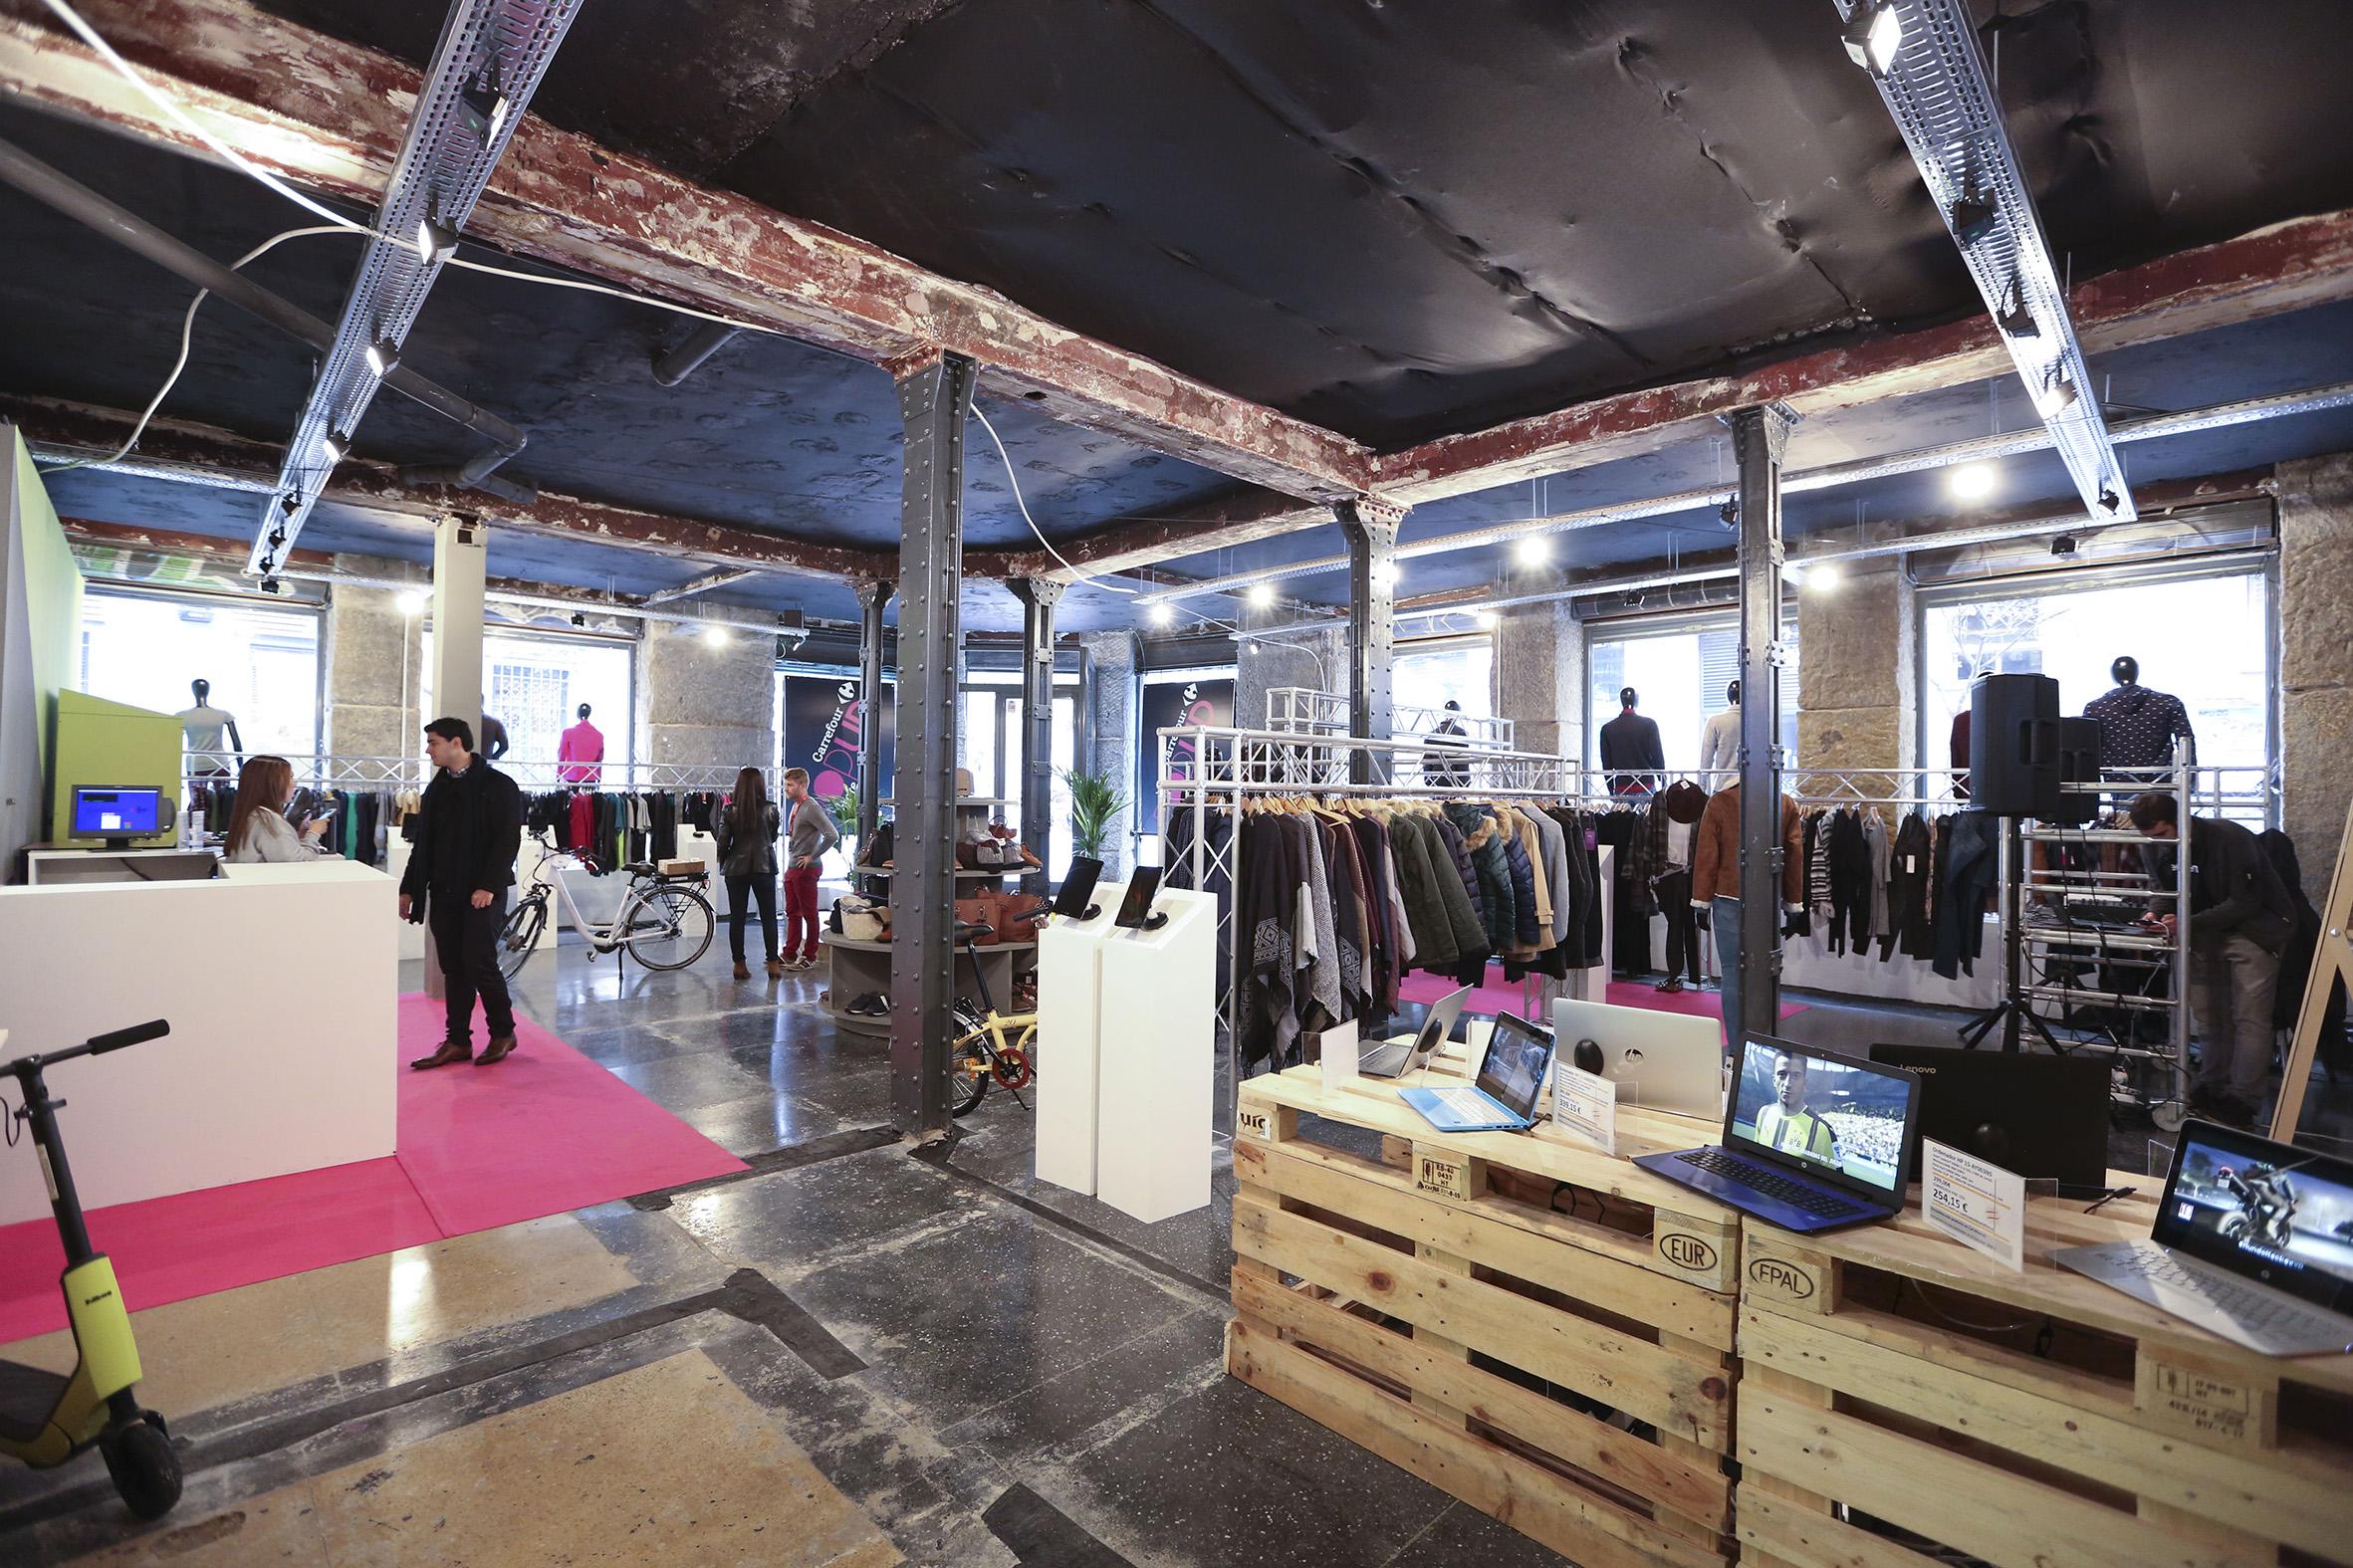 carrefour abre una pop up store en el centro de madrid. Black Bedroom Furniture Sets. Home Design Ideas